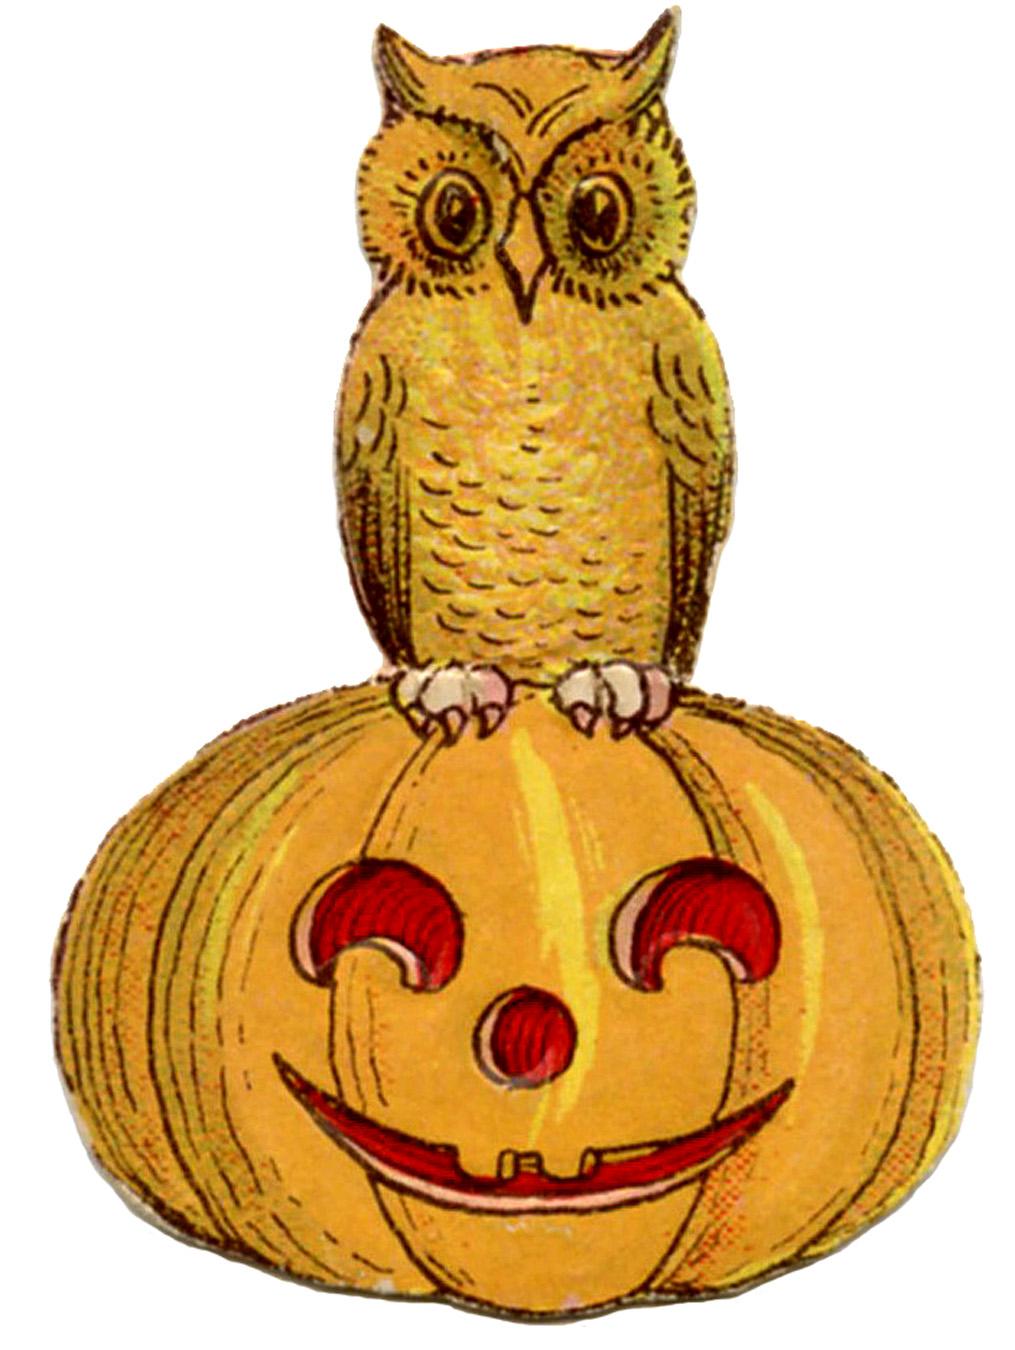 Vintage Halloween Clip Art - Cute Owl on Pumpkin - The Graphics Fairy